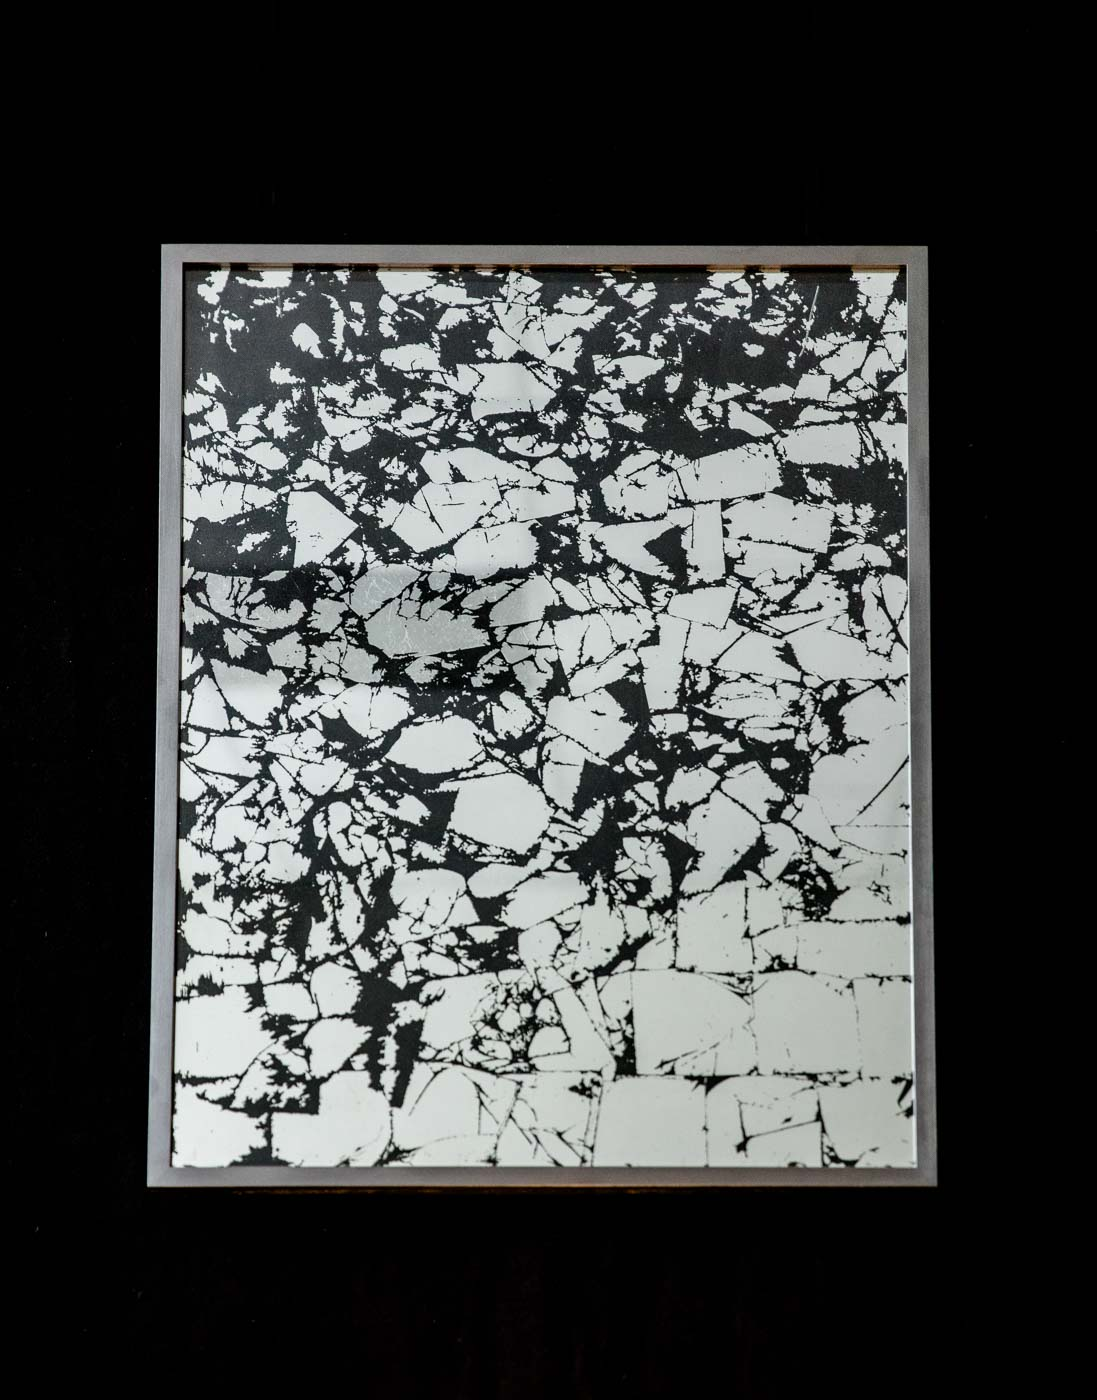 Marmorspiegel